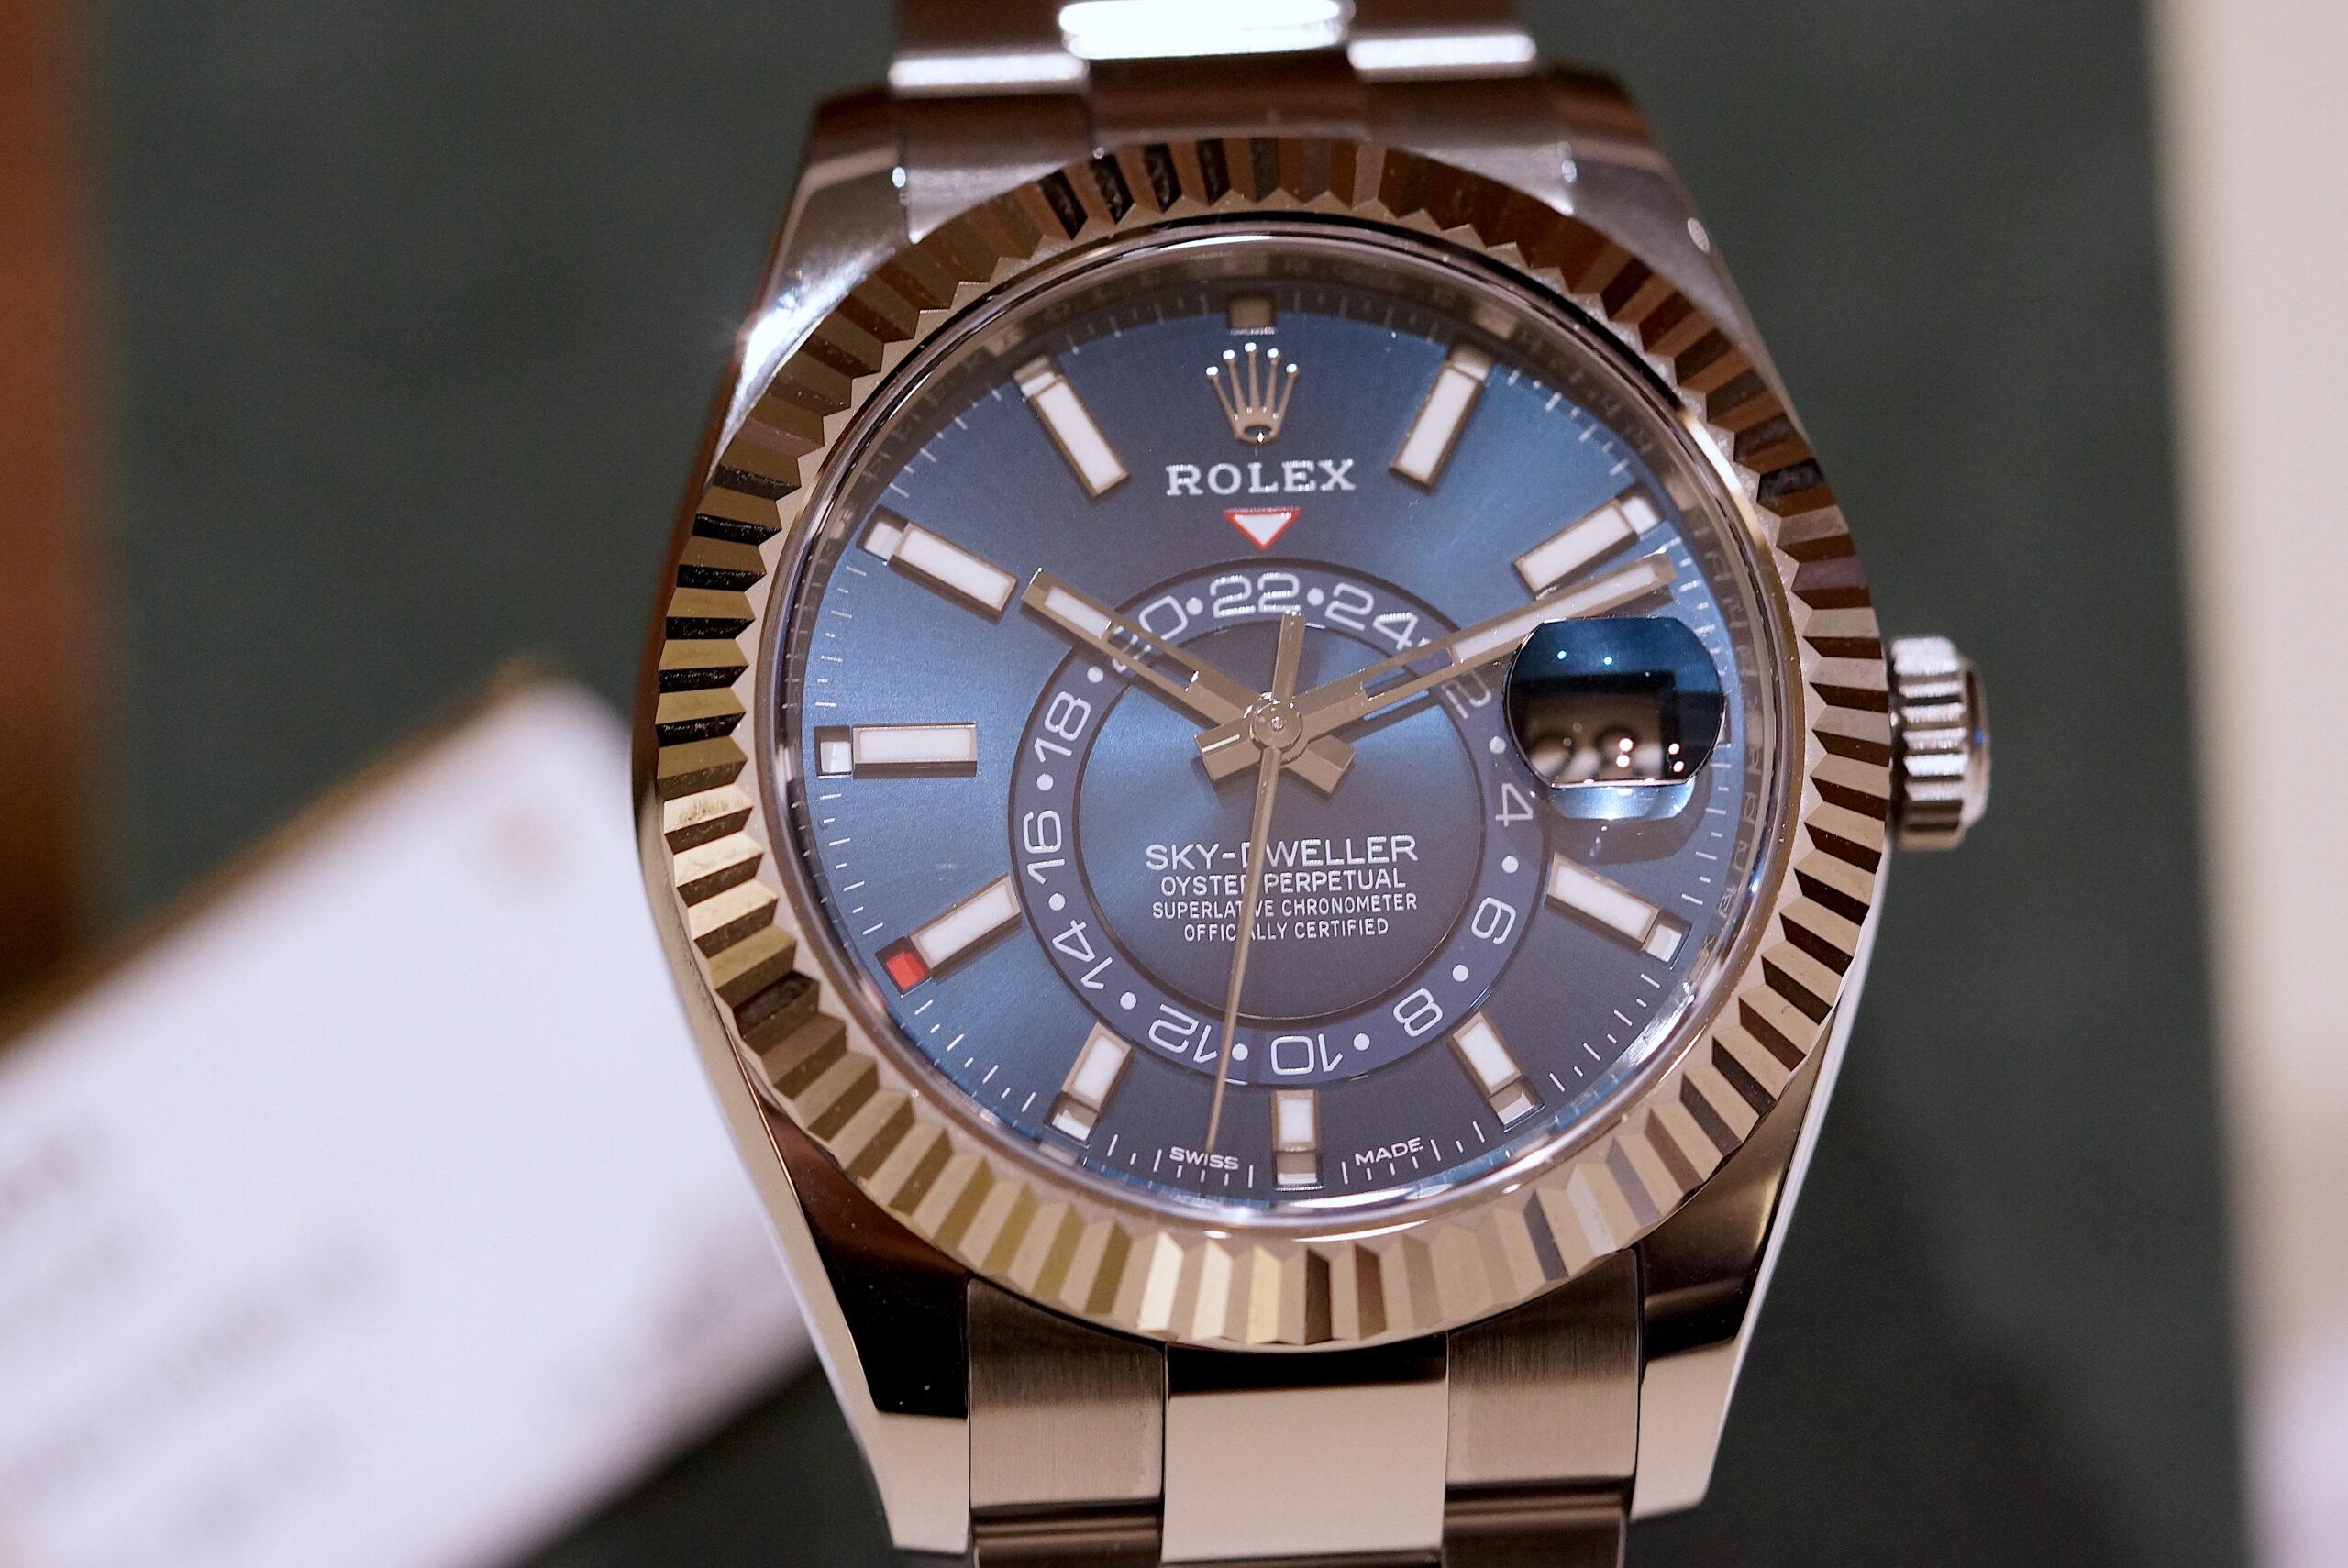 Rolex Oyster Perpetual 'Sky-Dweller'